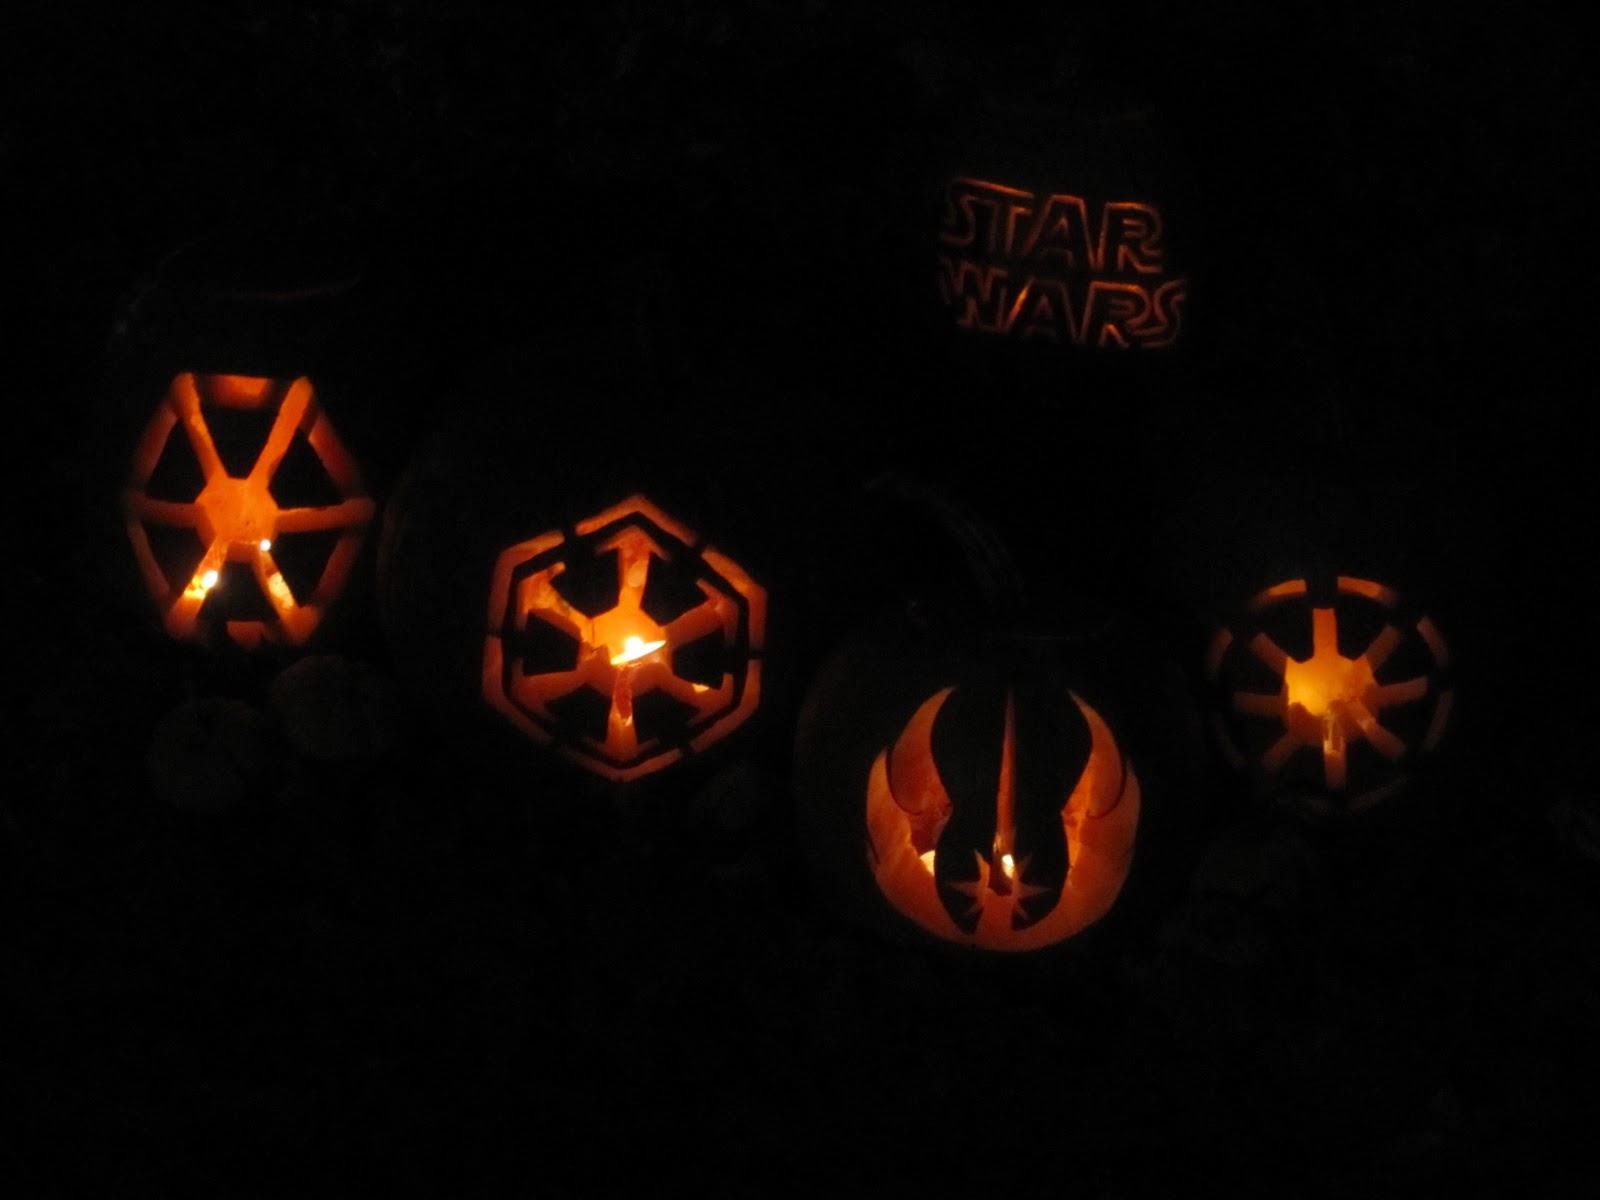 Download Wallpaper Halloween Star Wars - IMG_1292  Gallery_100656.JPG